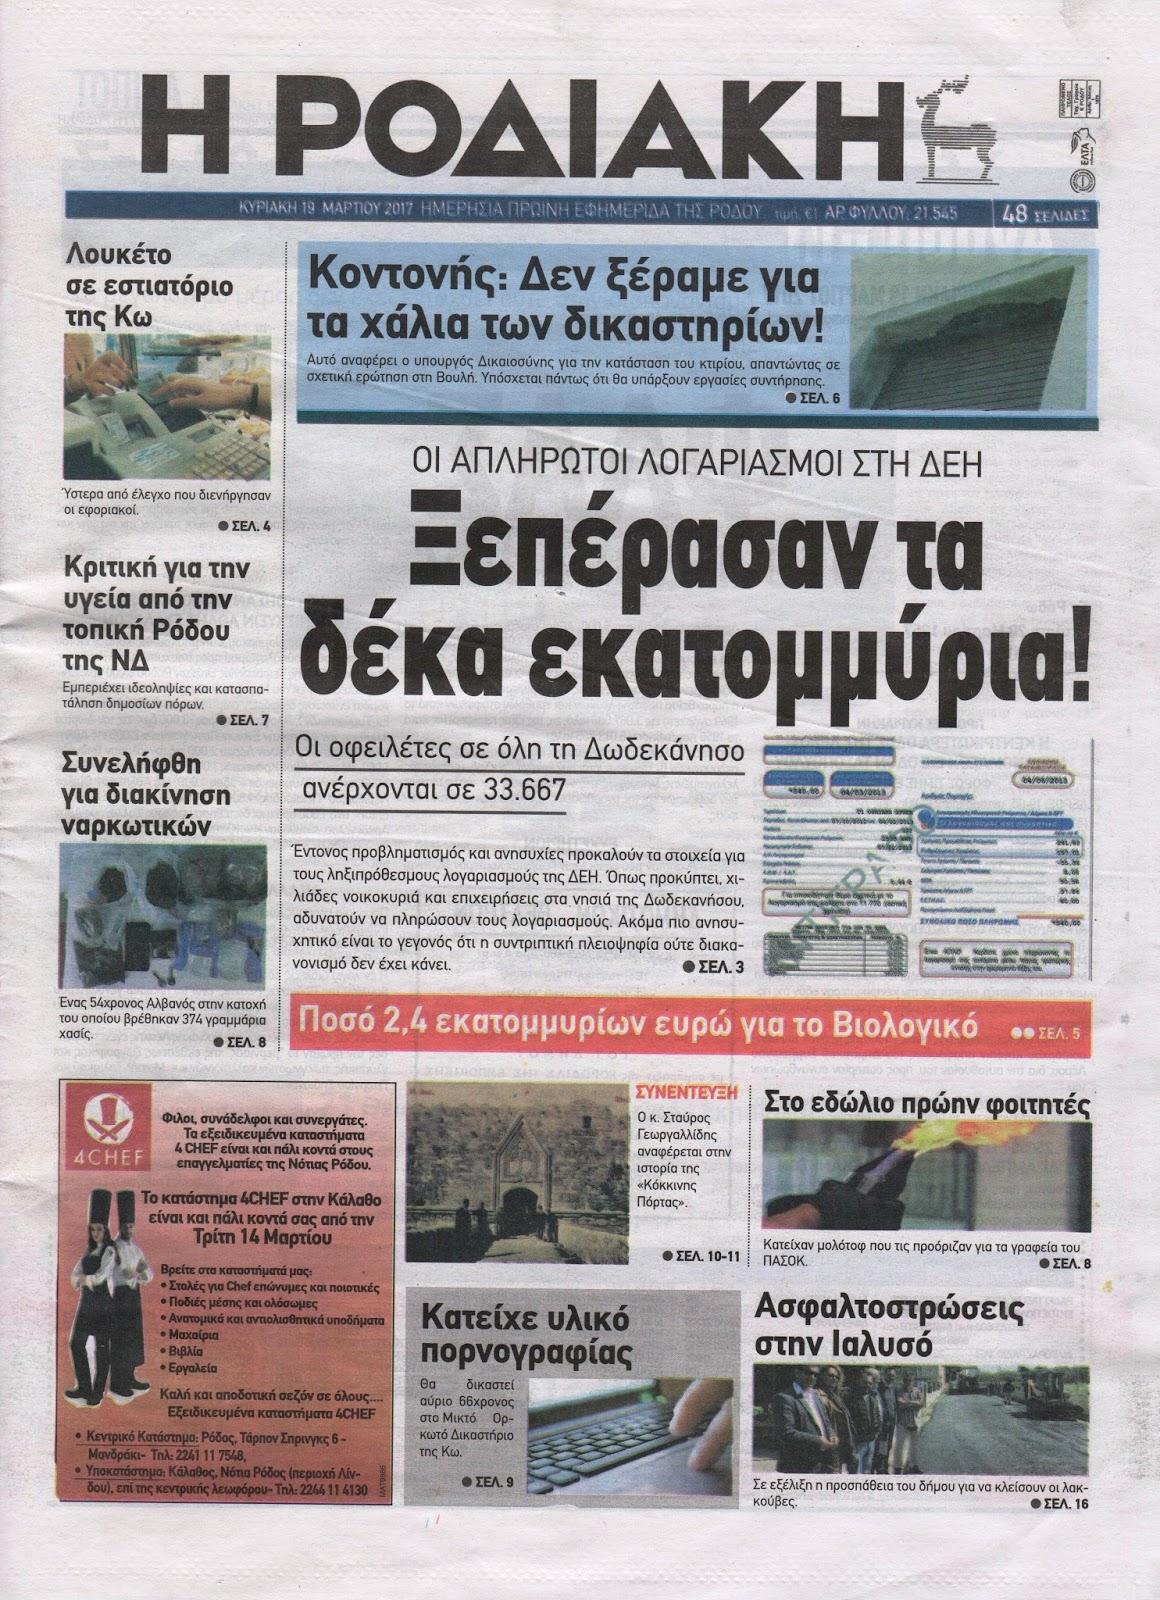 288437a628f0 Νέο άρθρο του Δημητρίου Π. Λυκούδη στην έντυπη εφημερίδα